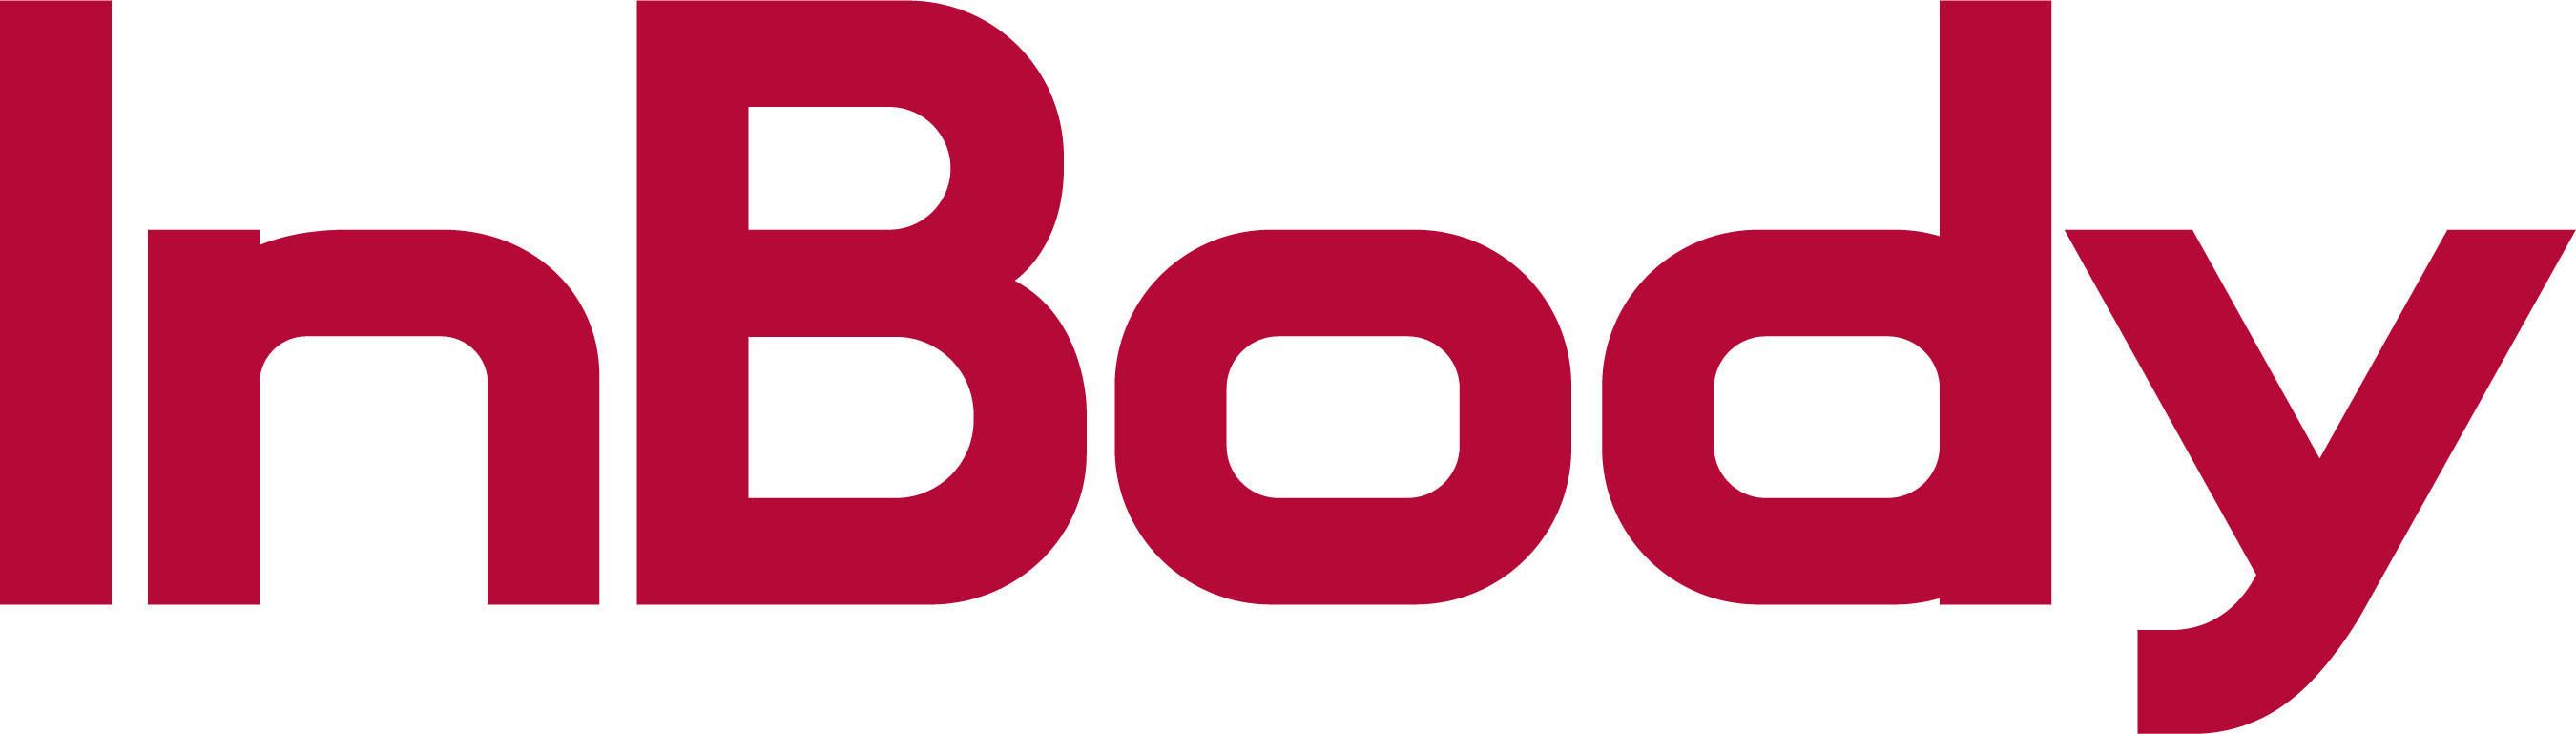 InBody: The Worldwide Leader in Body Composition Analysis. Visit InBody USA online at: www.inbodyusa.com